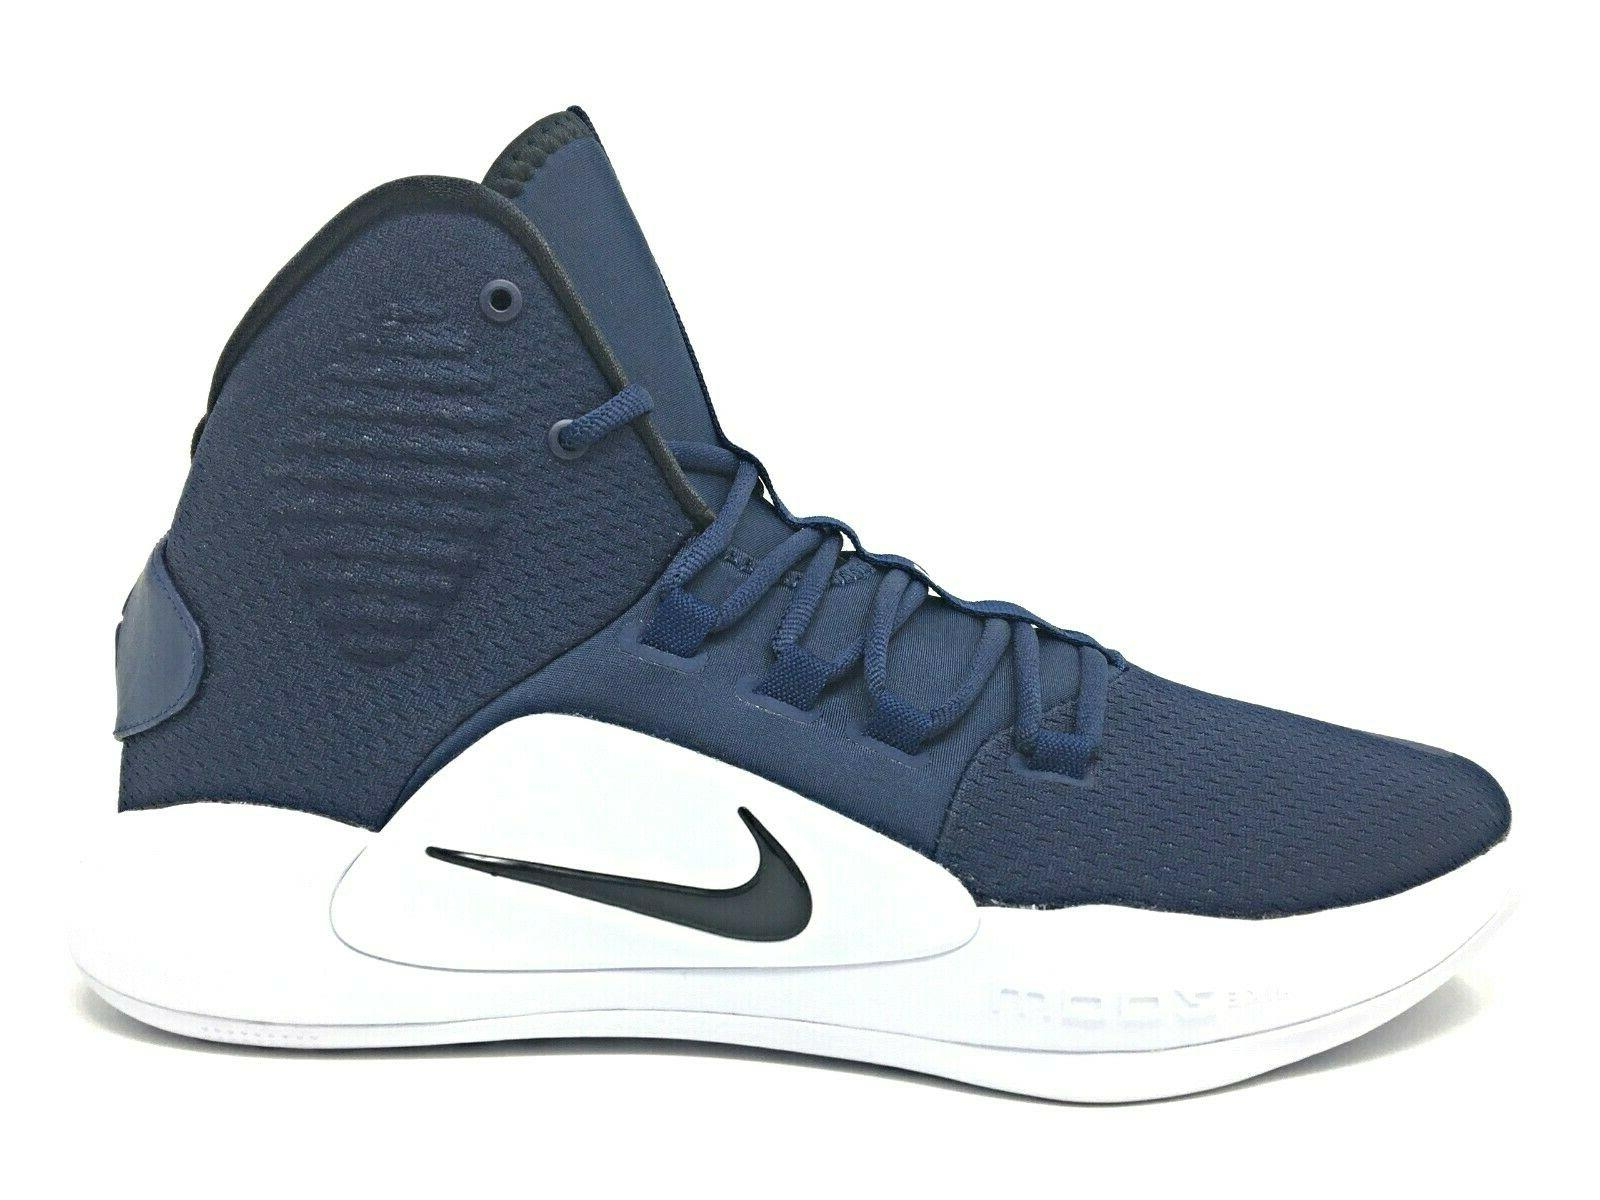 Nike Hyperdunk X Mens/Womens Basketball Shoes Navy Blue/White AR0467